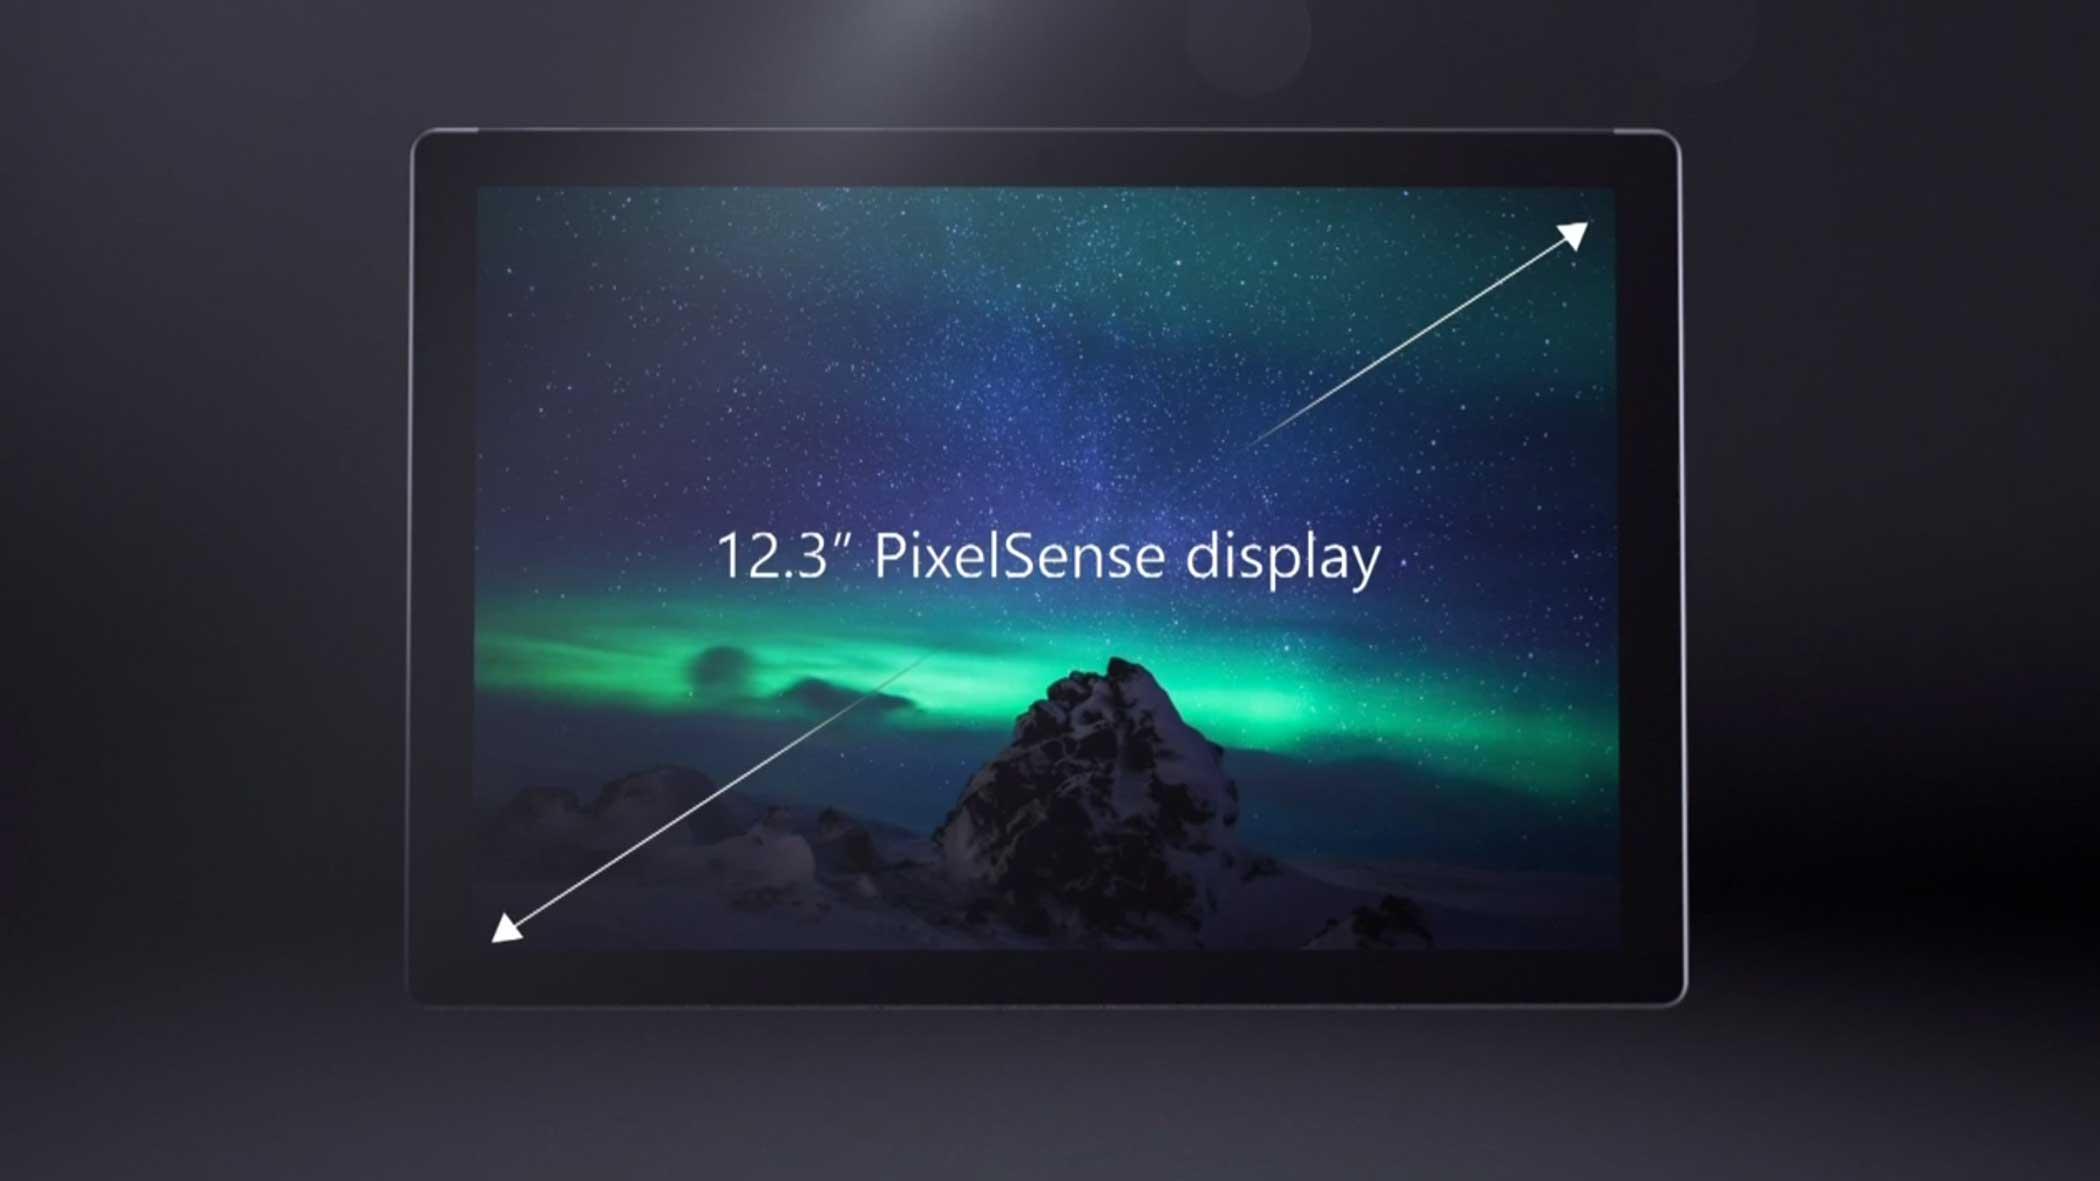 It's display is slightly smaller than Apple's iPad Pro